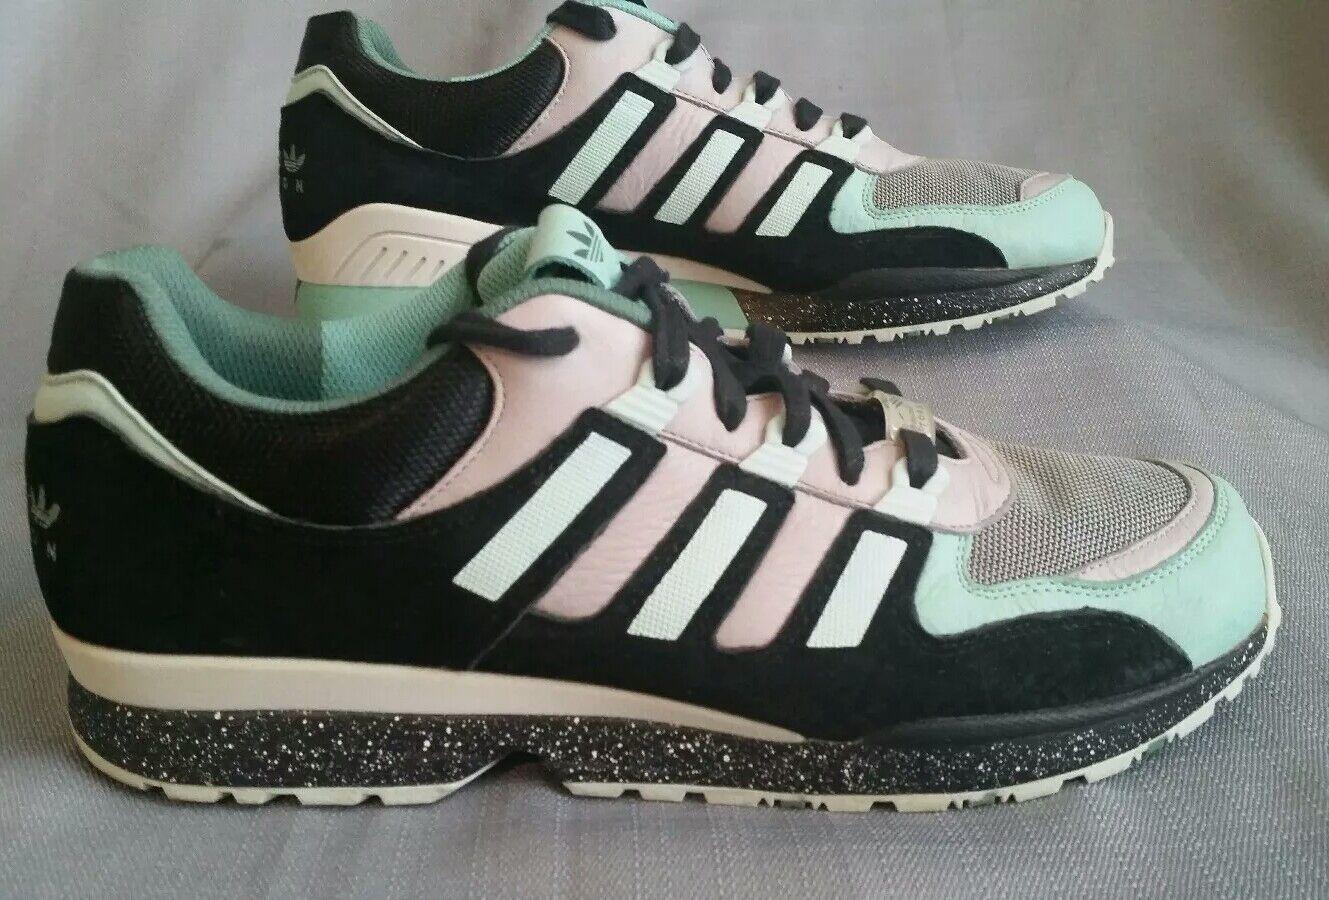 6387cd035c Adidas x Sneaker Freaker shoes Torsion Integral M22415 Size 10.5 Men's